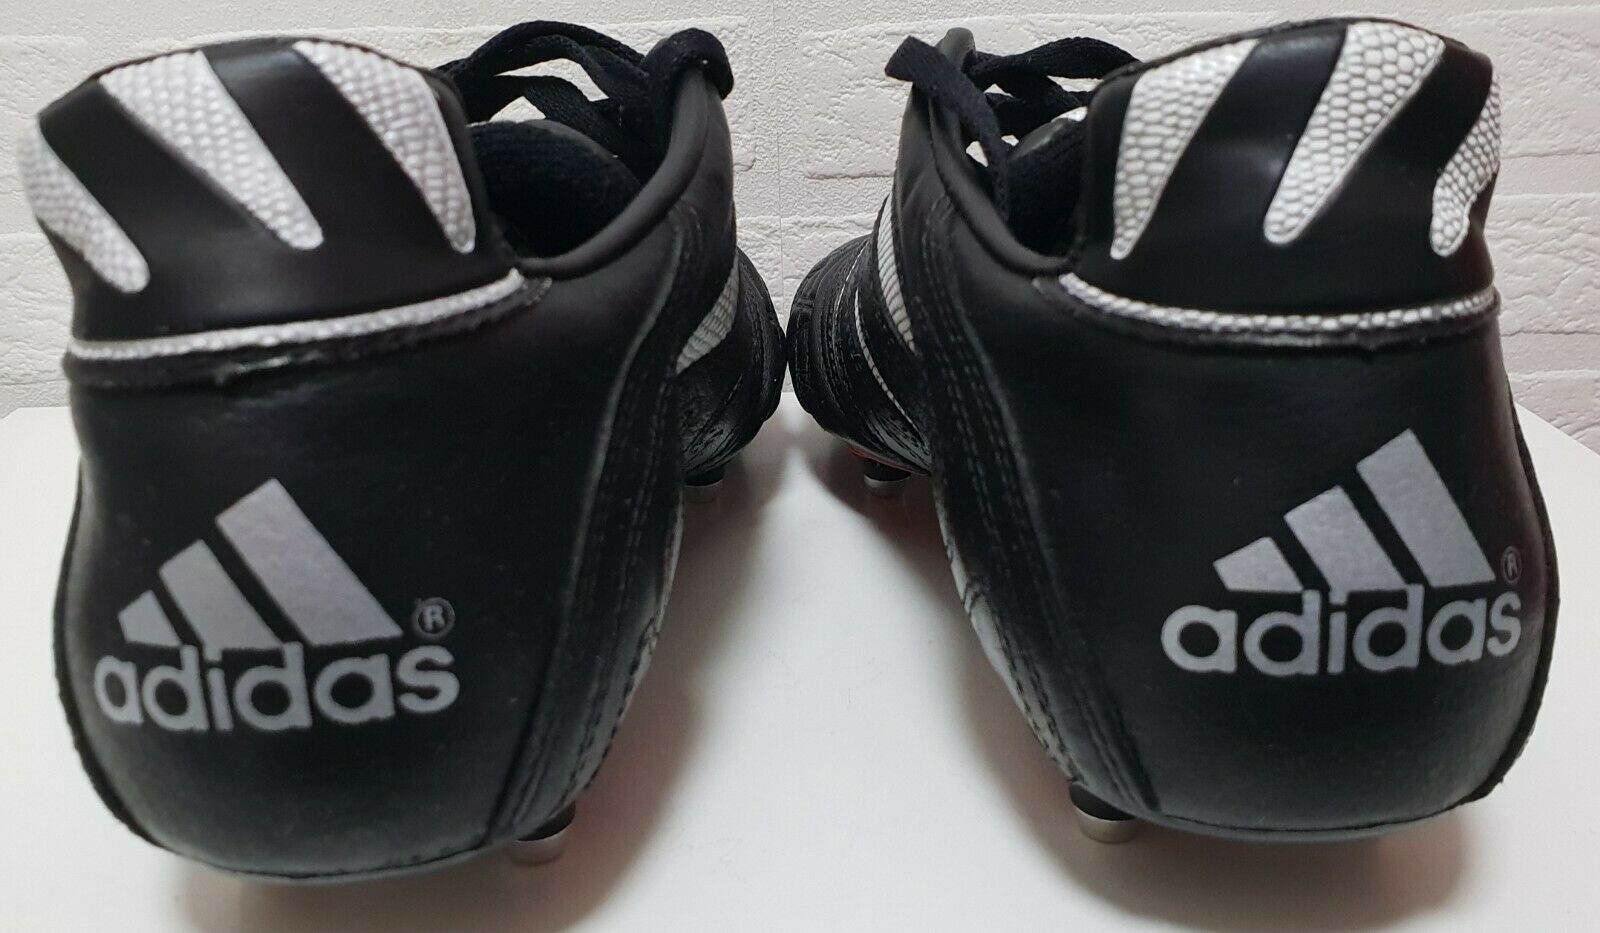 Adidas Adidas Adidas Protator Questra Fußballschuhe, 42 ; US 8,5 ; UK 8 Mania Absolute c8856f